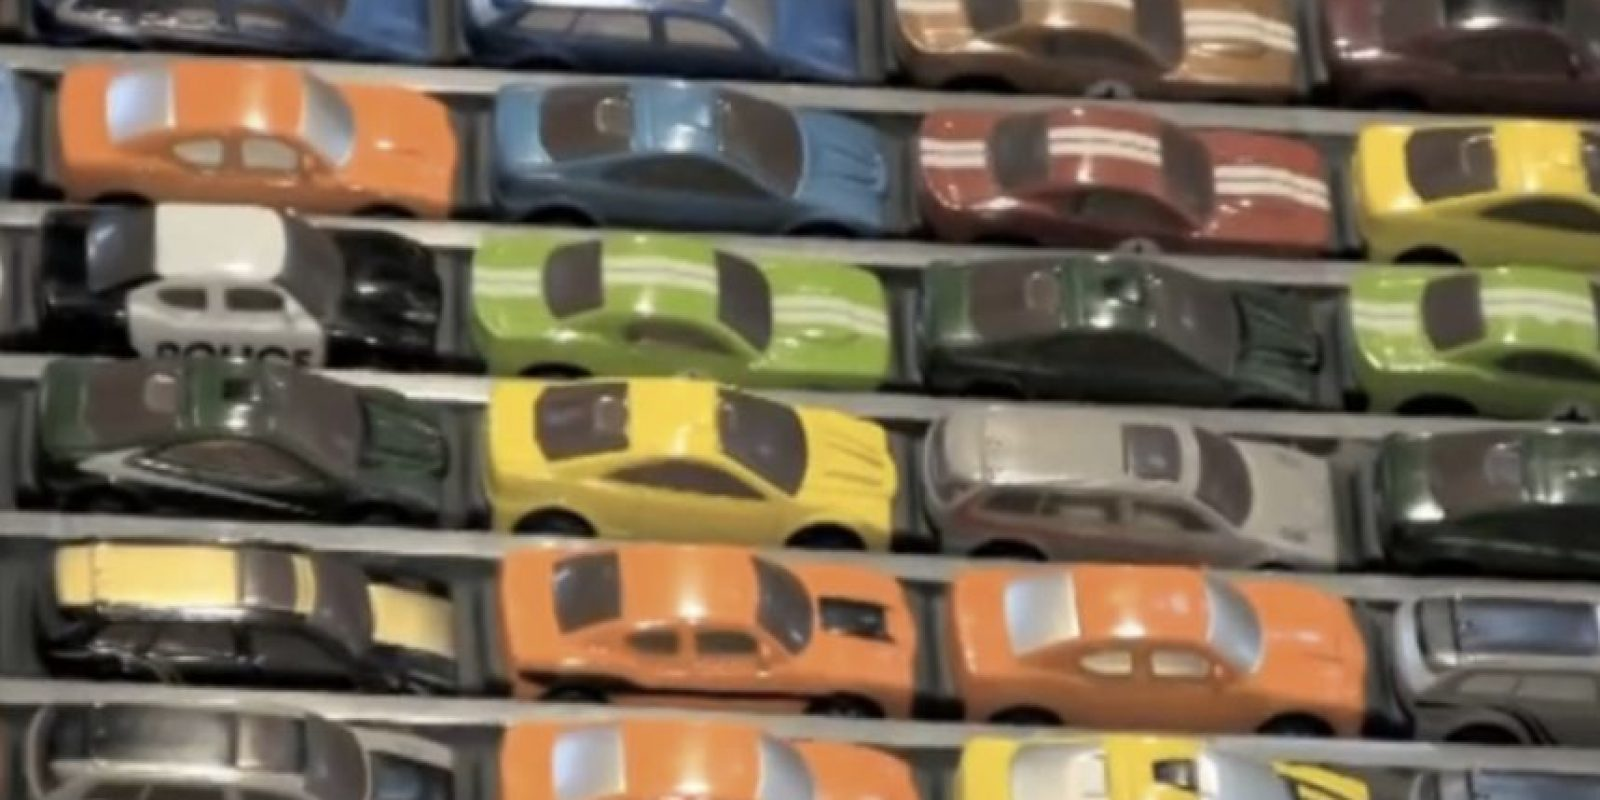 Se usan aproximadamente mil 100 autos en total. Foto:Chris Burden